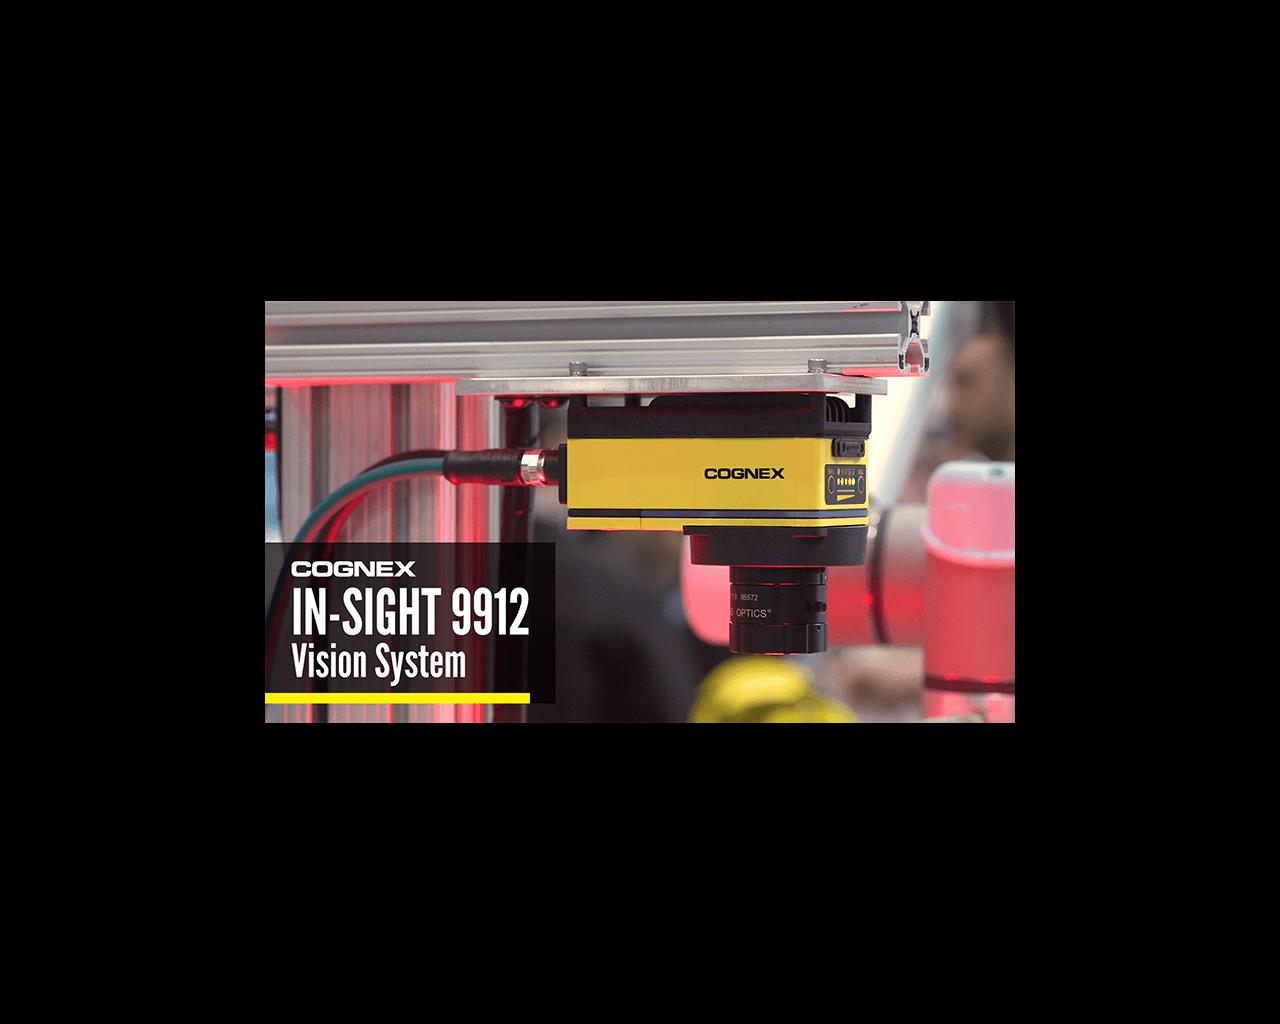 In-Sight 9912 Trade Show Demo